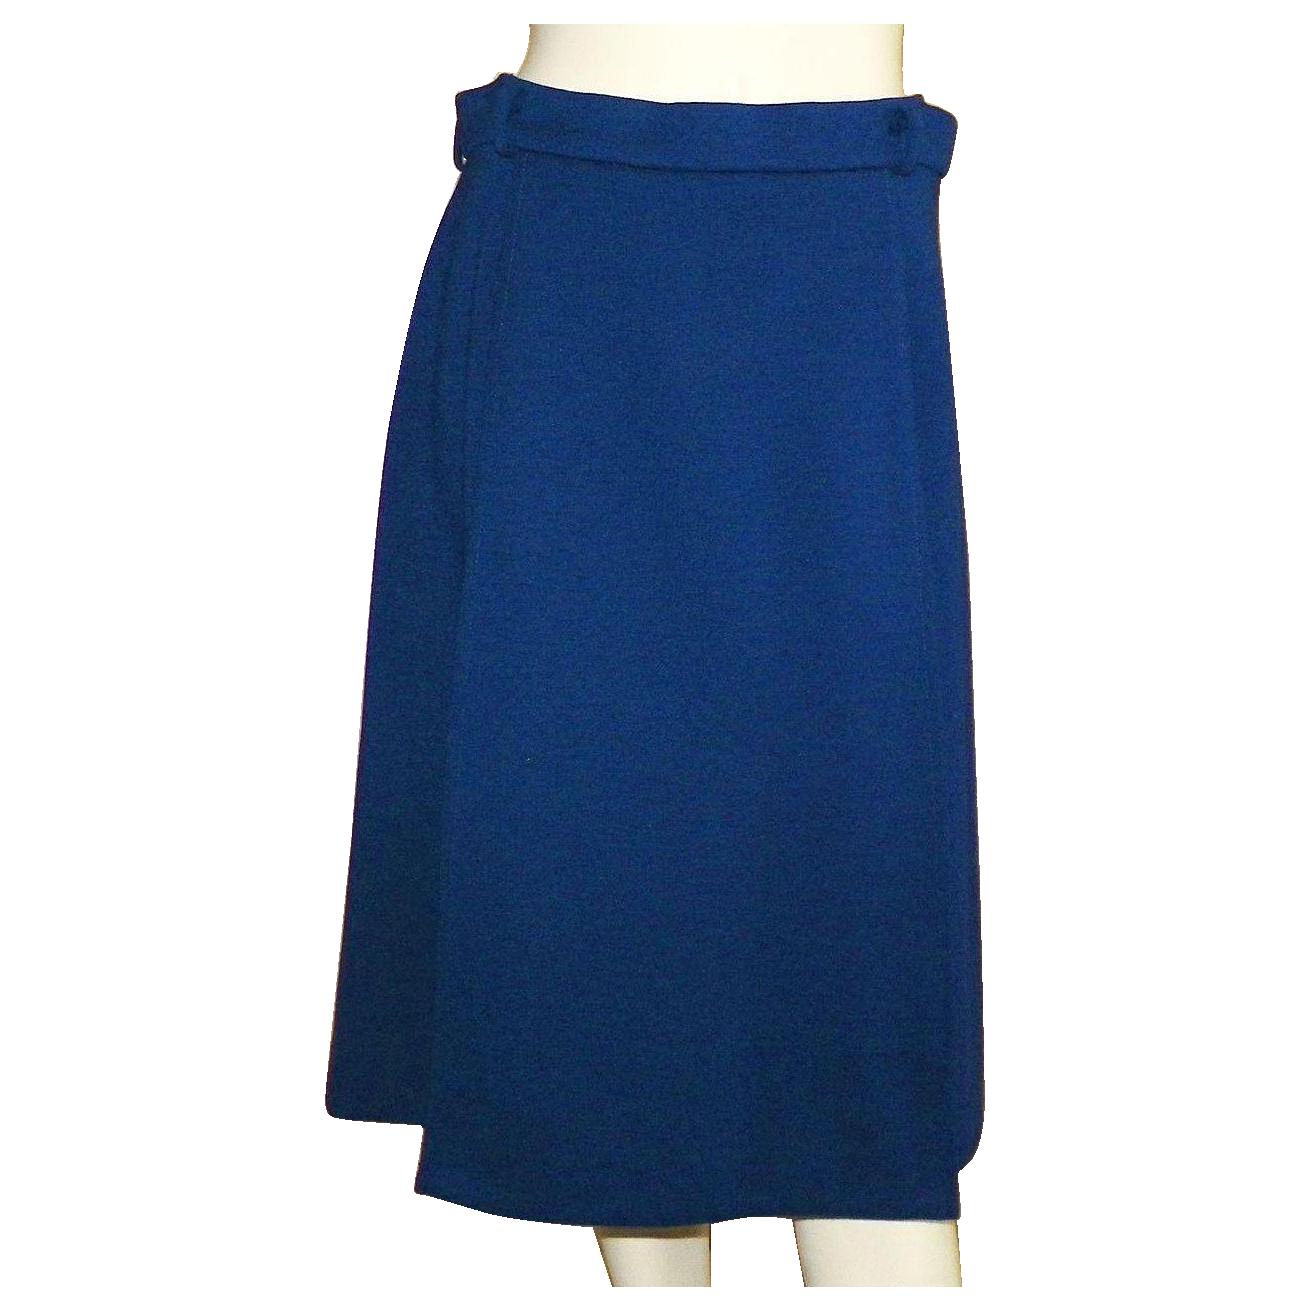 Vintage 1960's Jaeger Of Great Britain Navy Blue Skirt